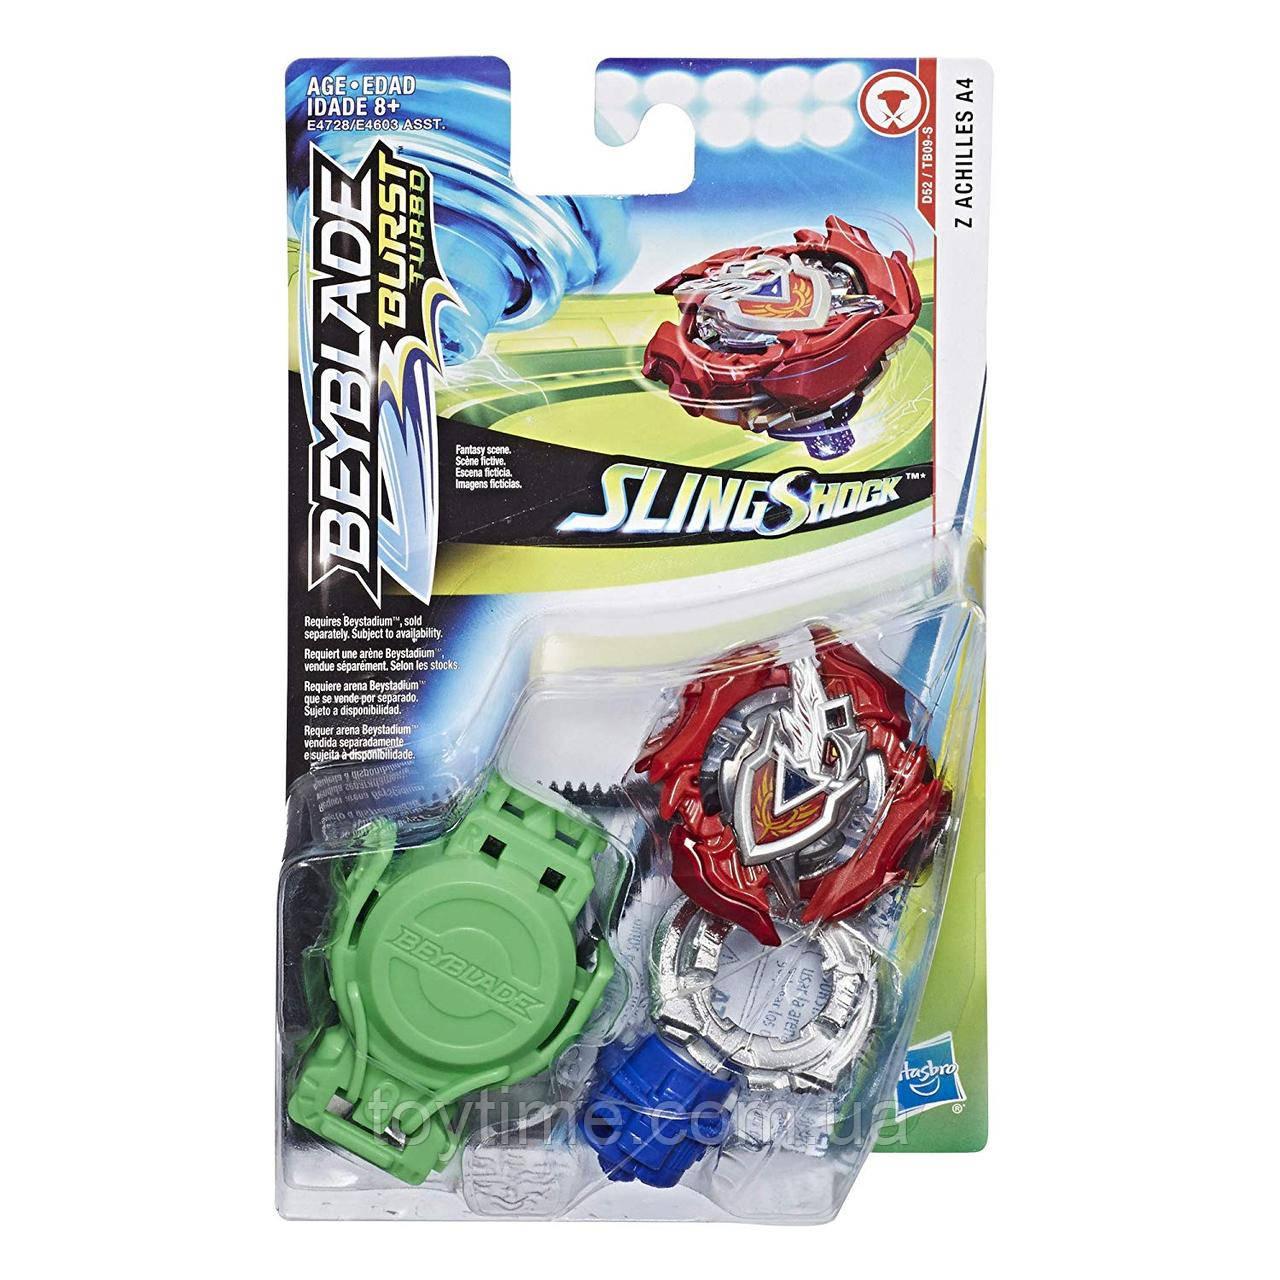 Волчок Бейблейд Z Achilles A4 4 серии от Хасбро / Hasbro Beyblade Burst Turbo Slingshock Z Achilles A4